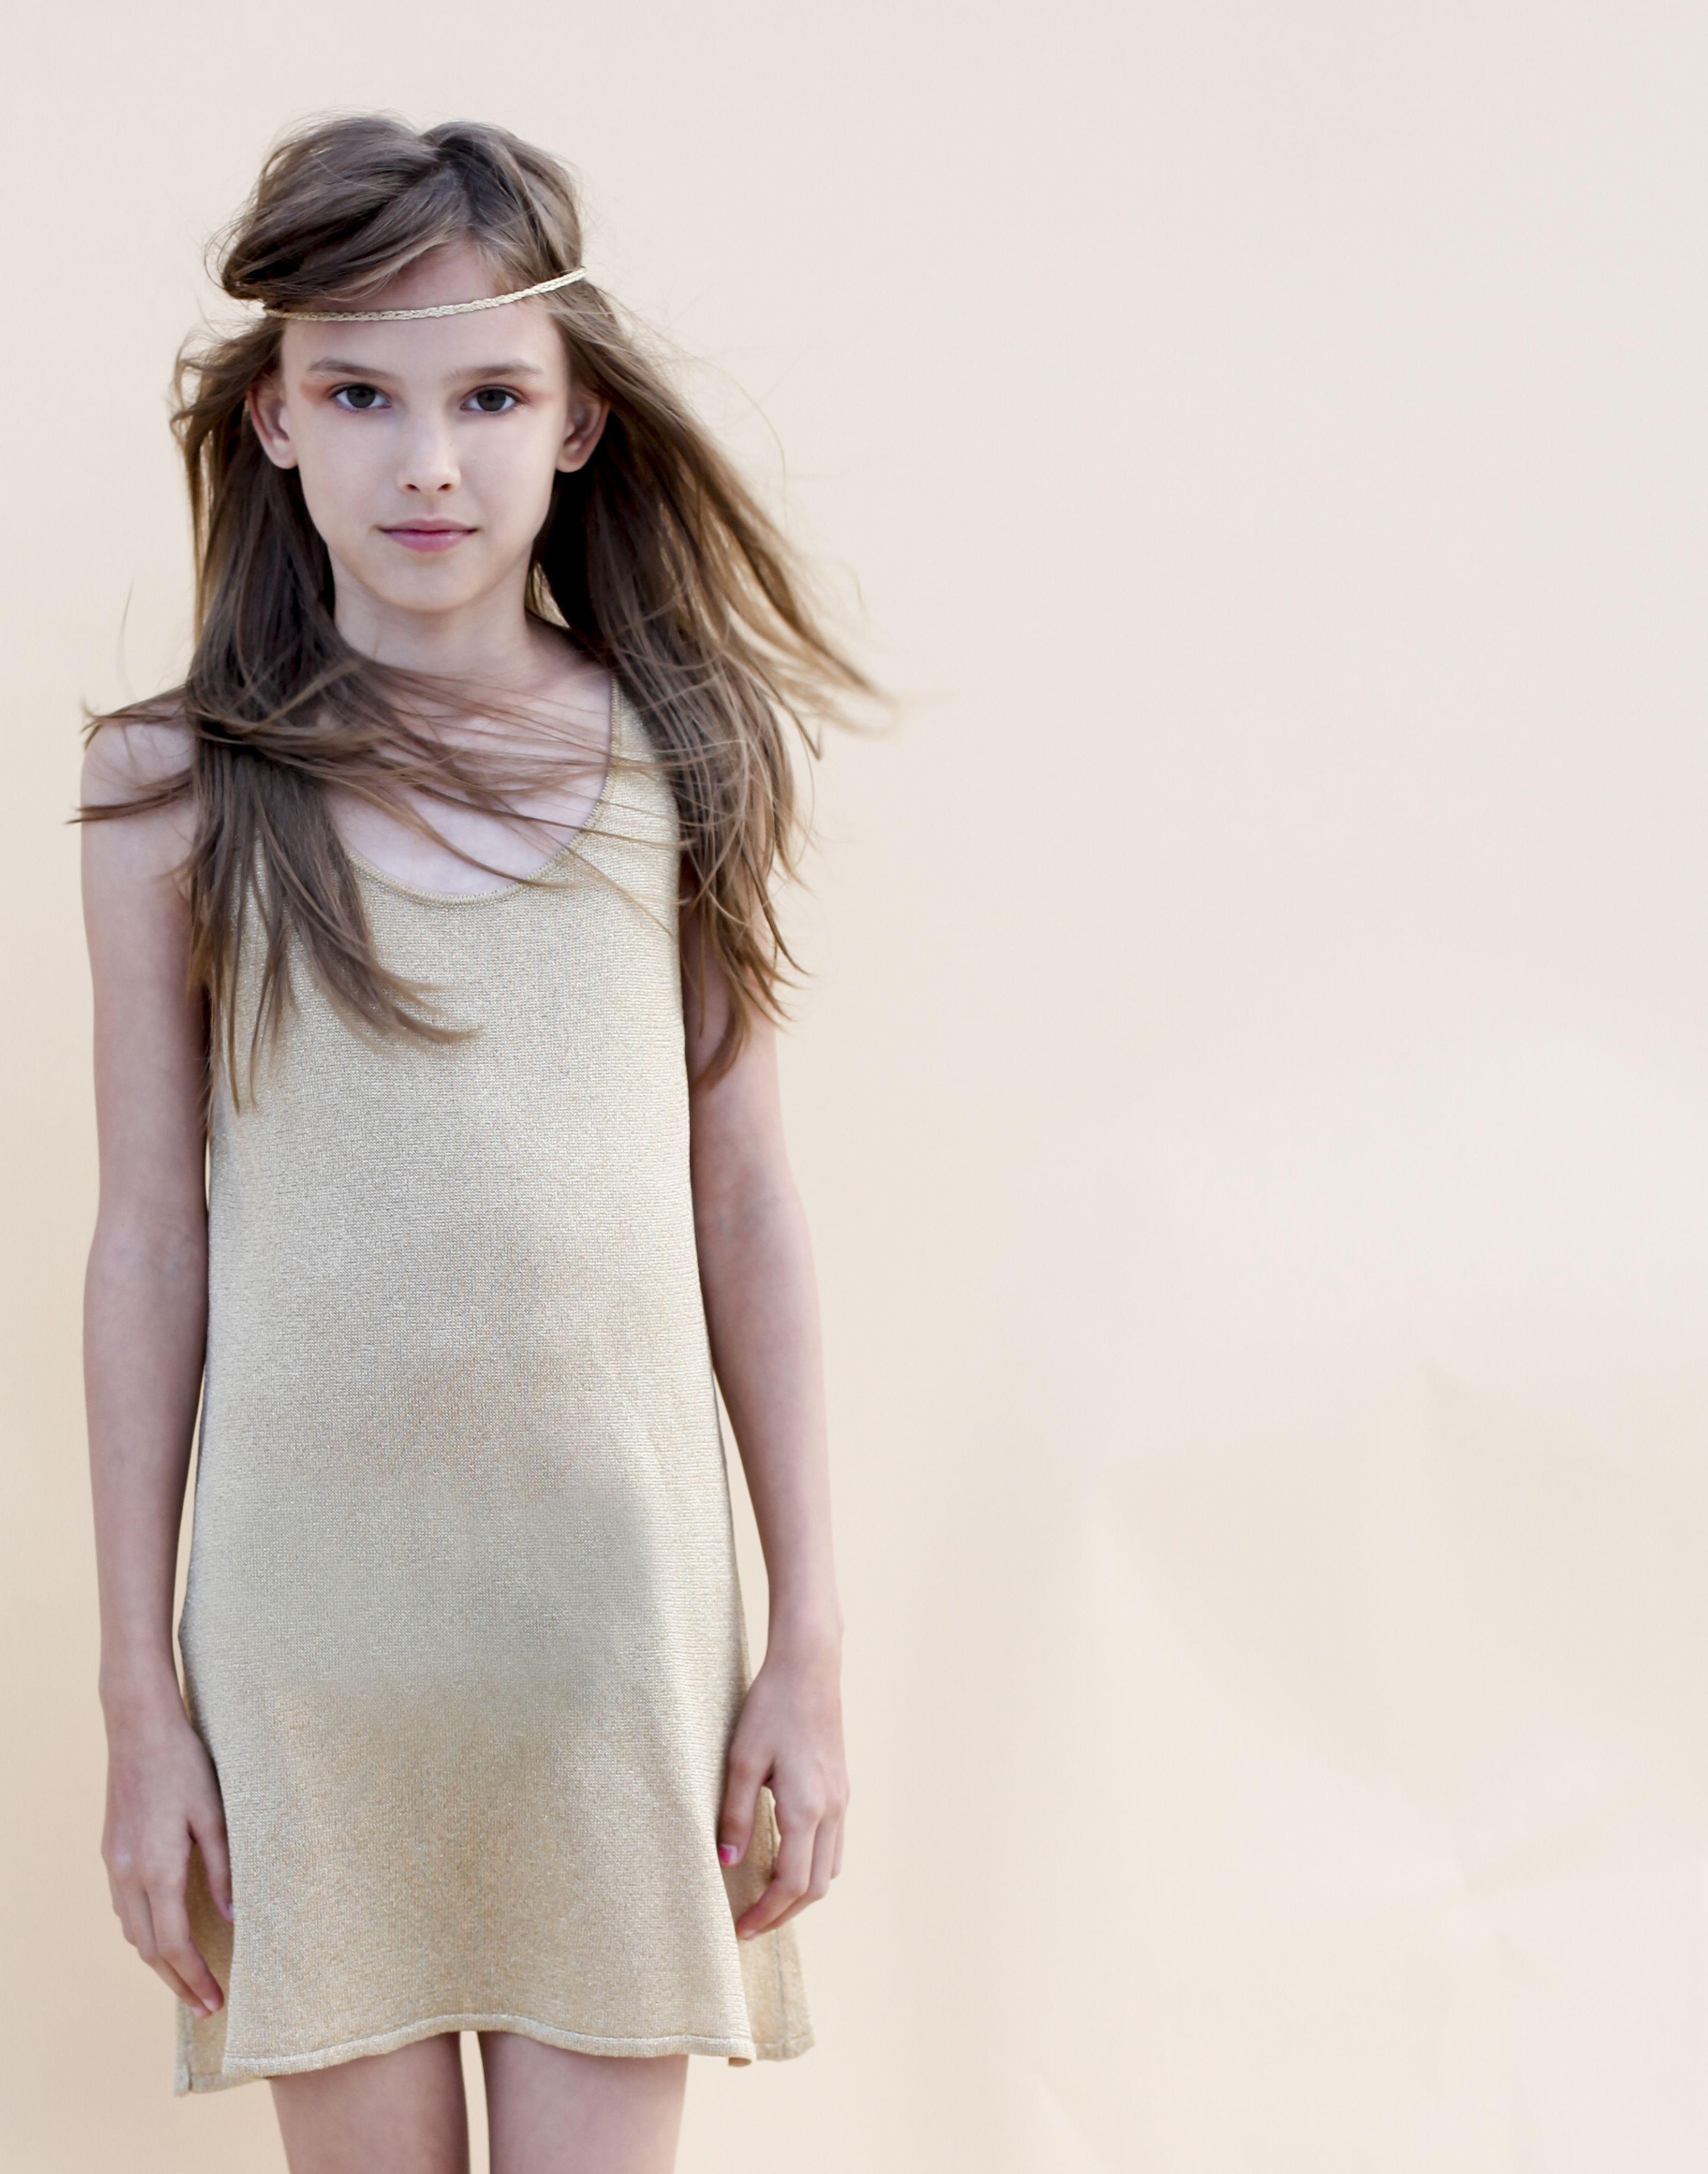 Teen Clothing Websites | Teenage Fashion Clothing Store | Teen Clothing Usa #teenkidfashionandbeauty Teen Clothing Websites | Teenage Fashion Clothing Store | Teen Clothing Usa #teenkidfashionandbeauty